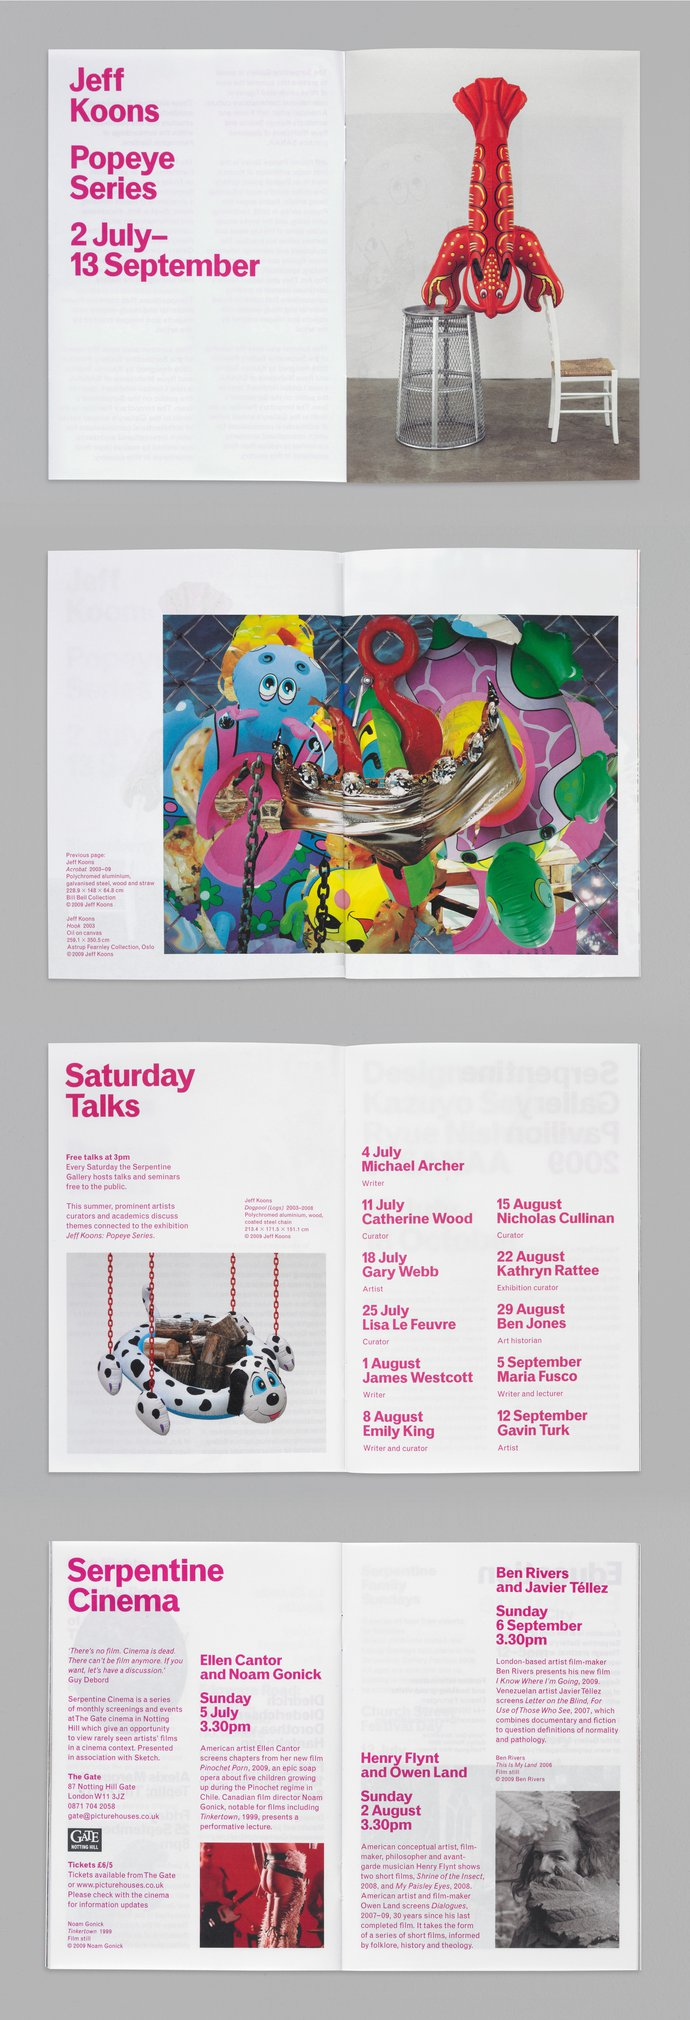 Serpentine Gallery – Identity, 2009, image 7